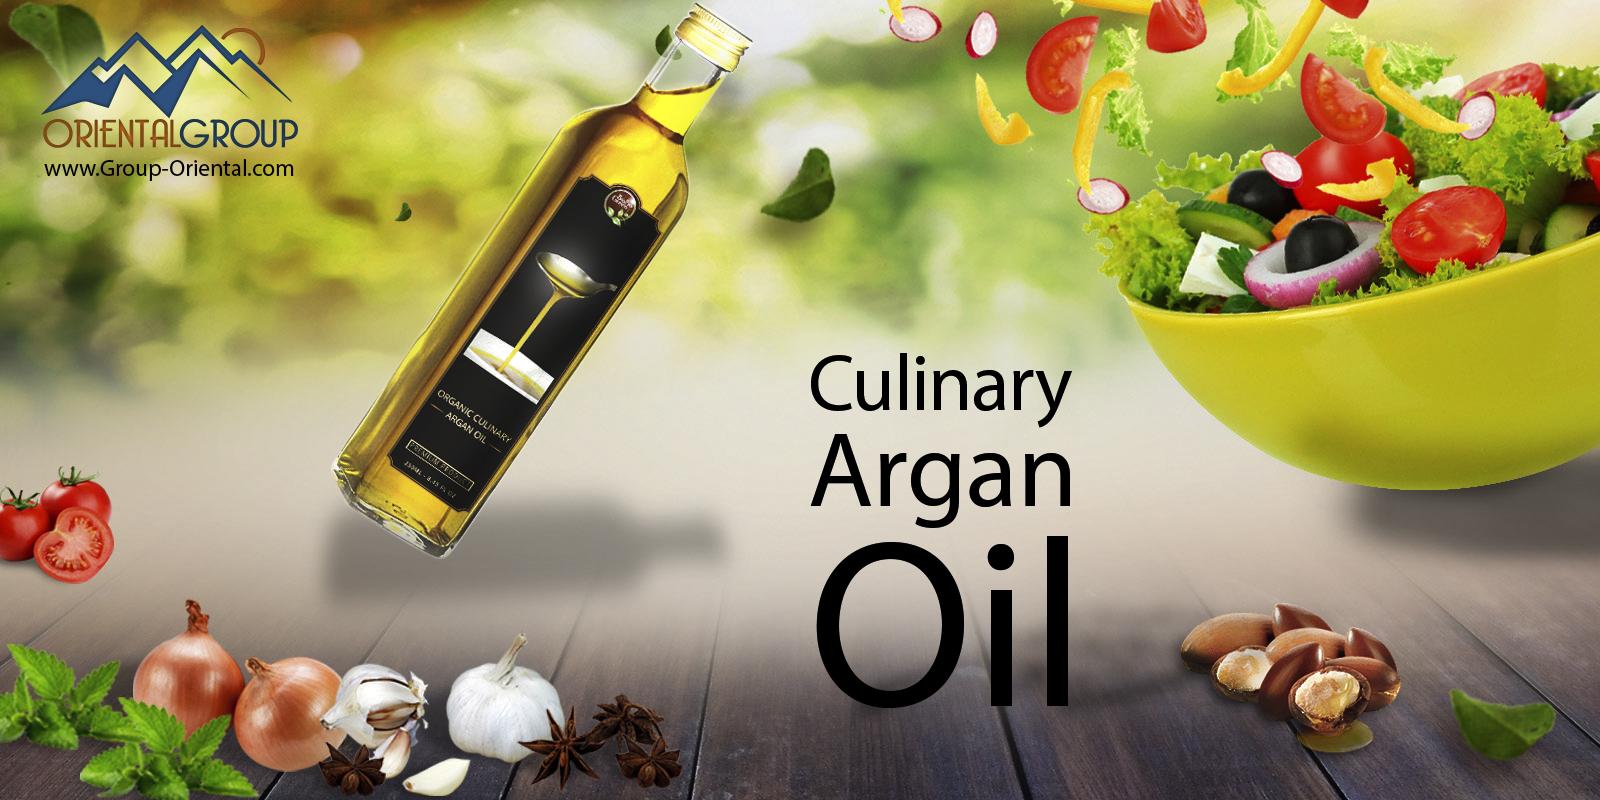 Argan Oil Culinary